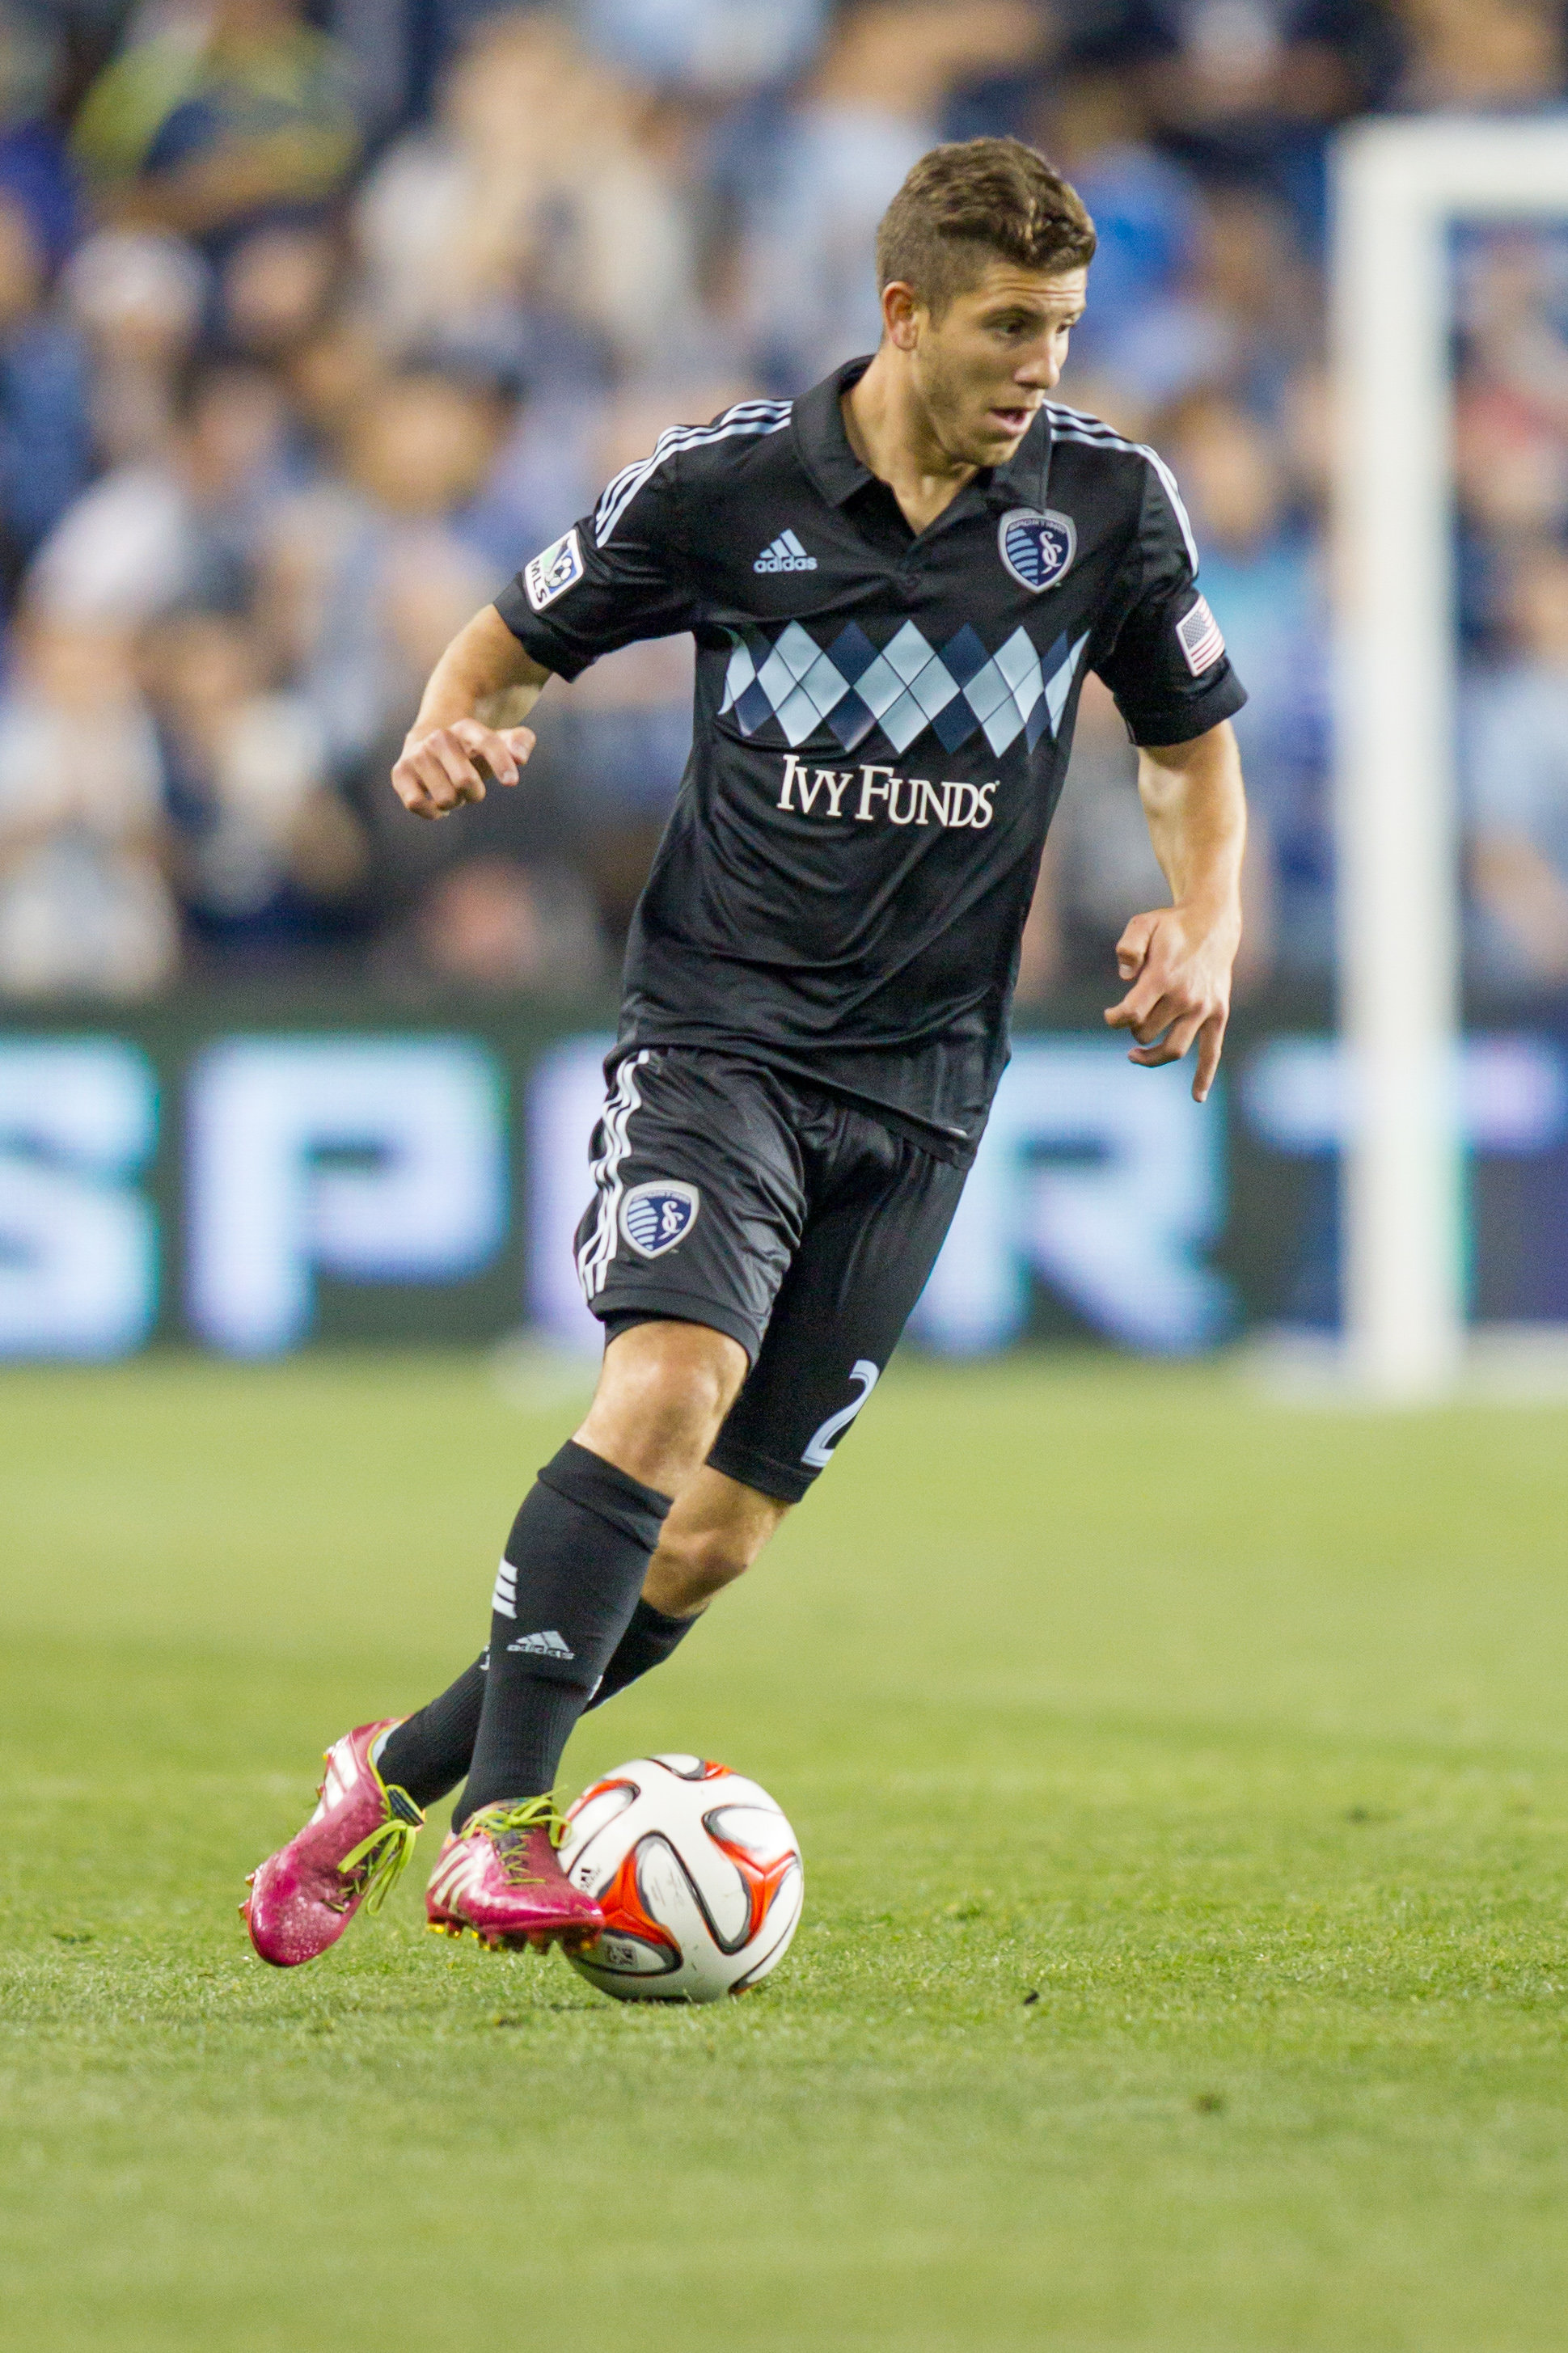 SOCCER: APR 19 MLS - Impact at Sporting KC